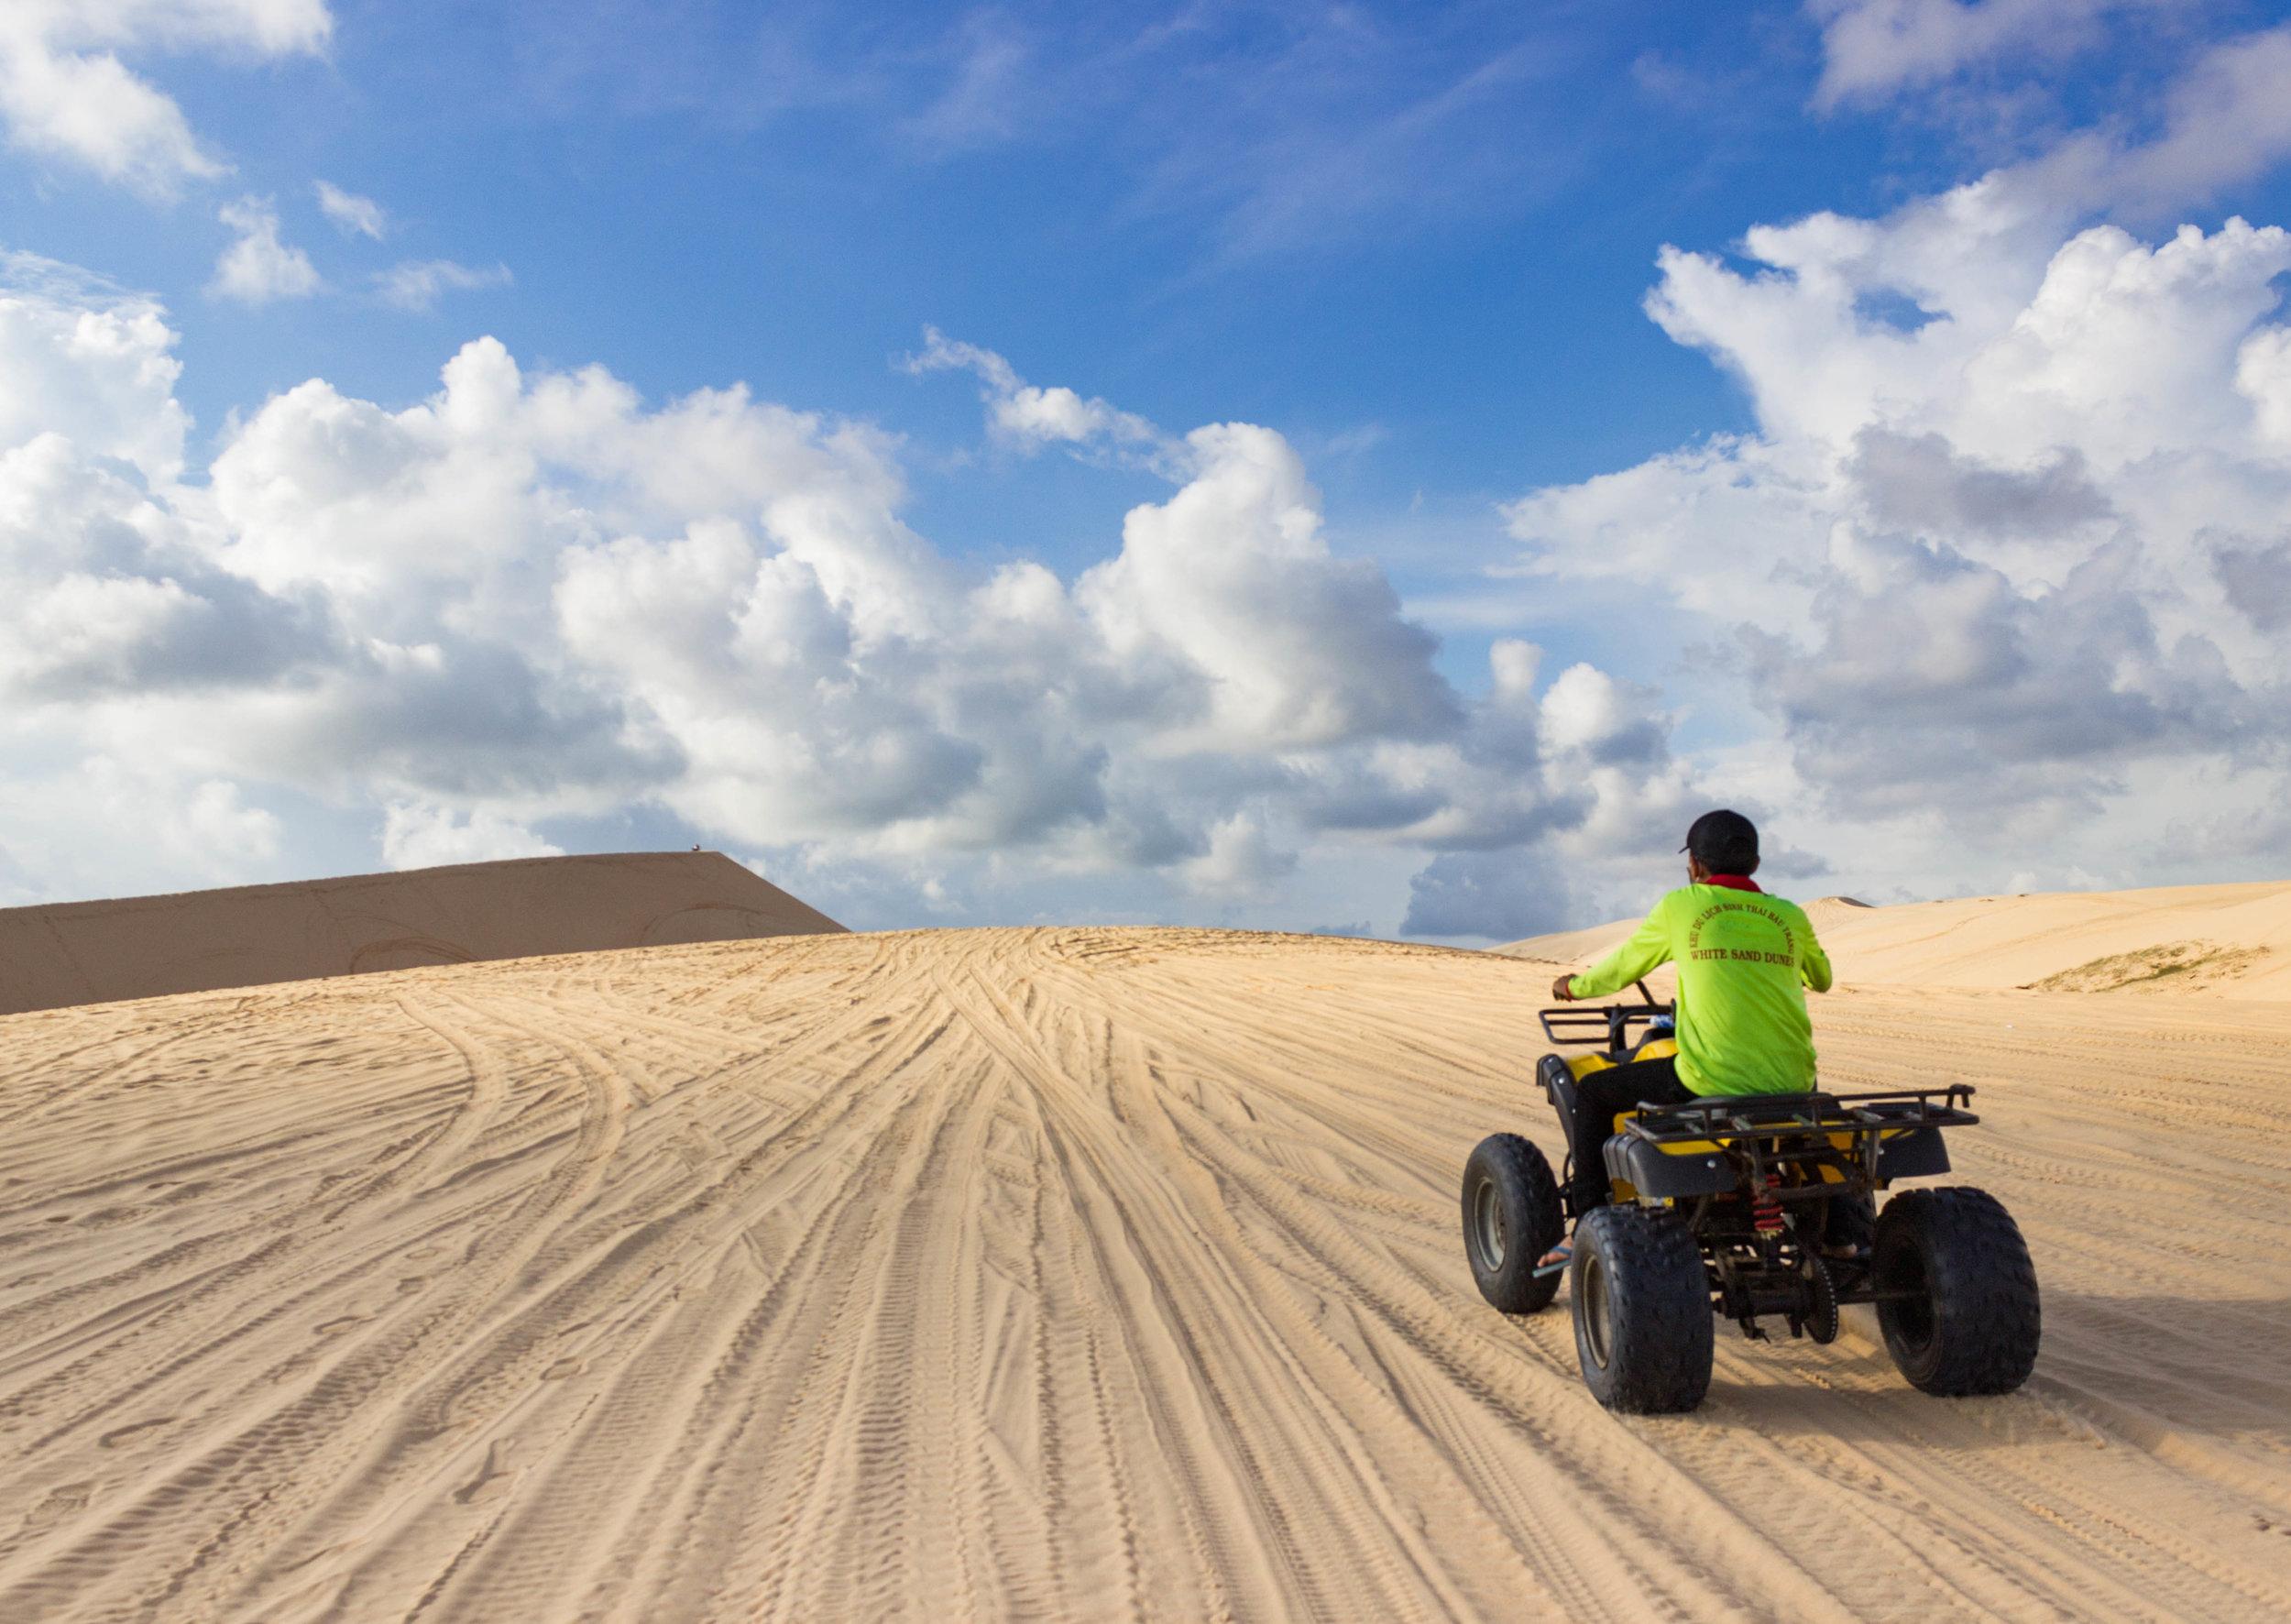 Riding on ATV's in the white sand dunes of Mui Ne